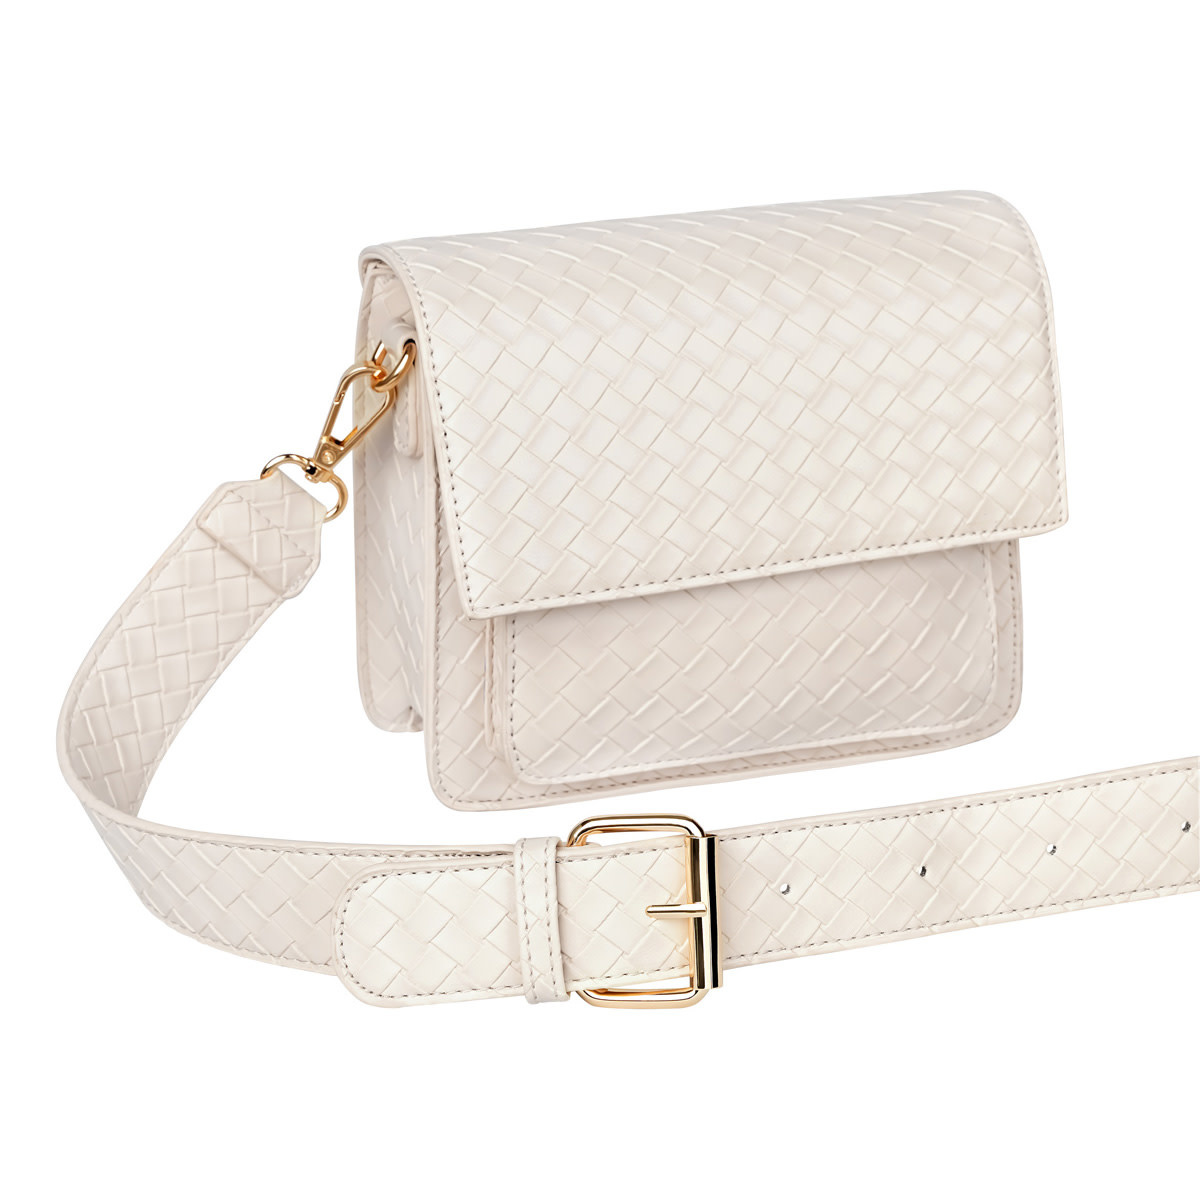 With love Bag braided  Cream 18cm x 15cm